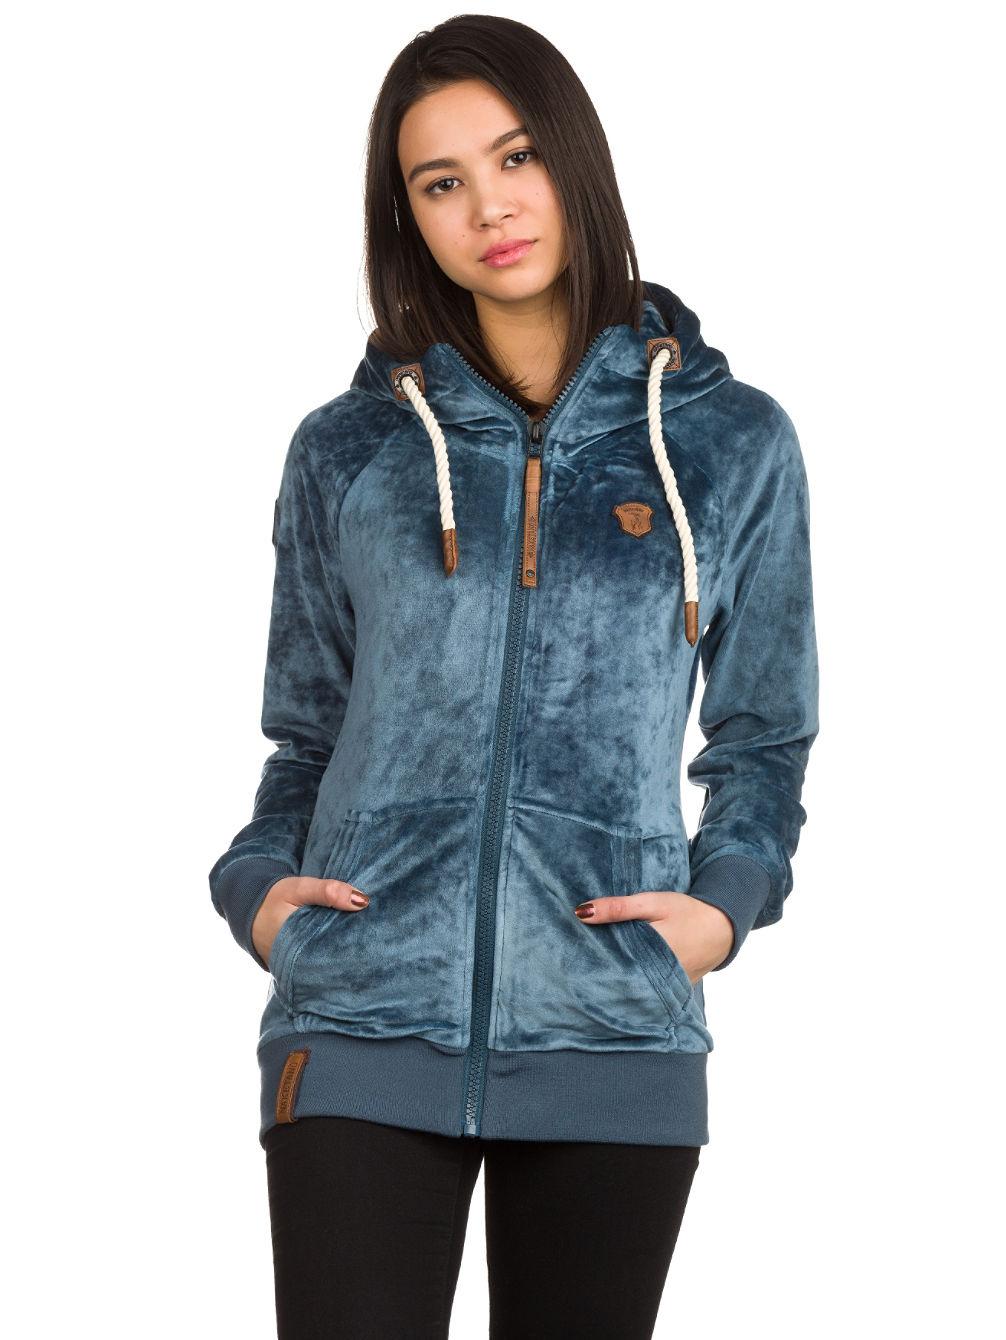 buy naketano brazzo mack iii zip hoodie online at blue. Black Bedroom Furniture Sets. Home Design Ideas